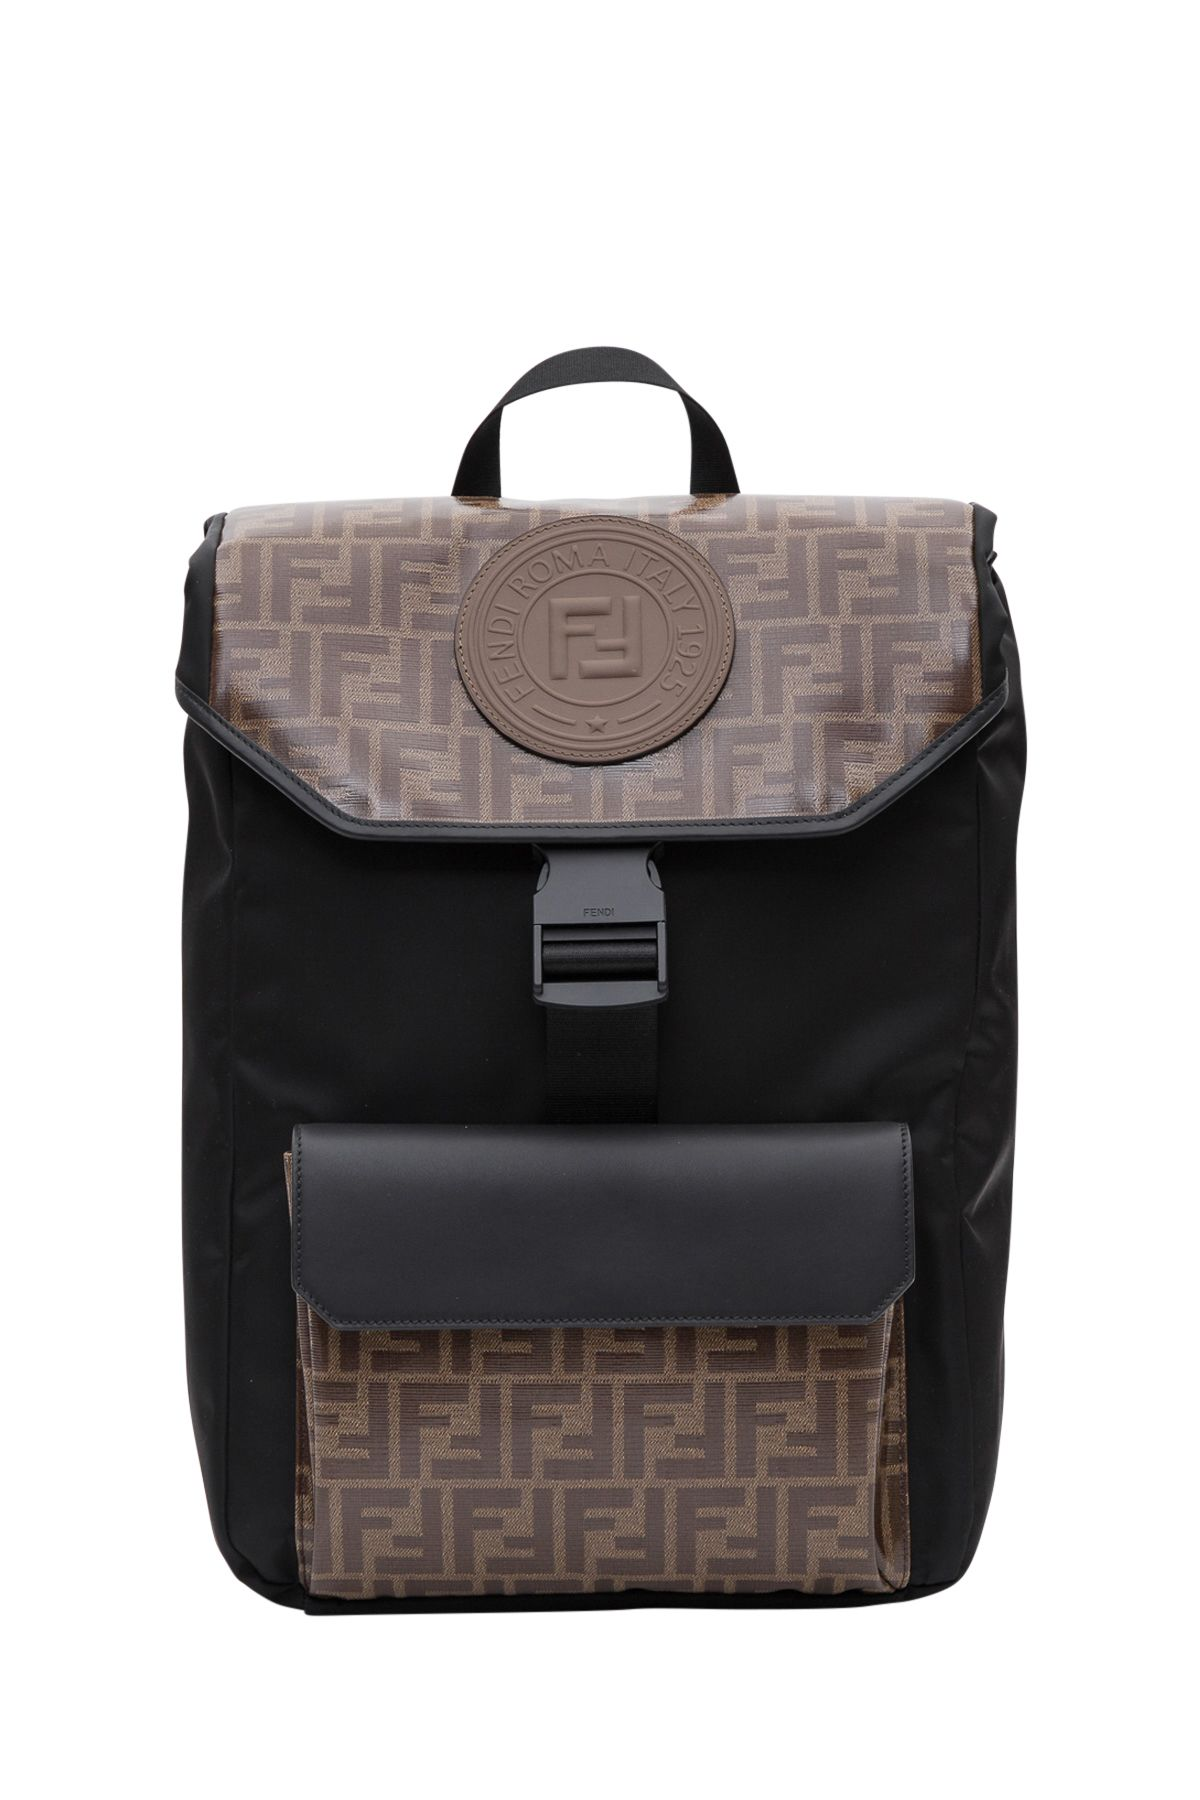 Fendi Multicolour Fabric Backpack